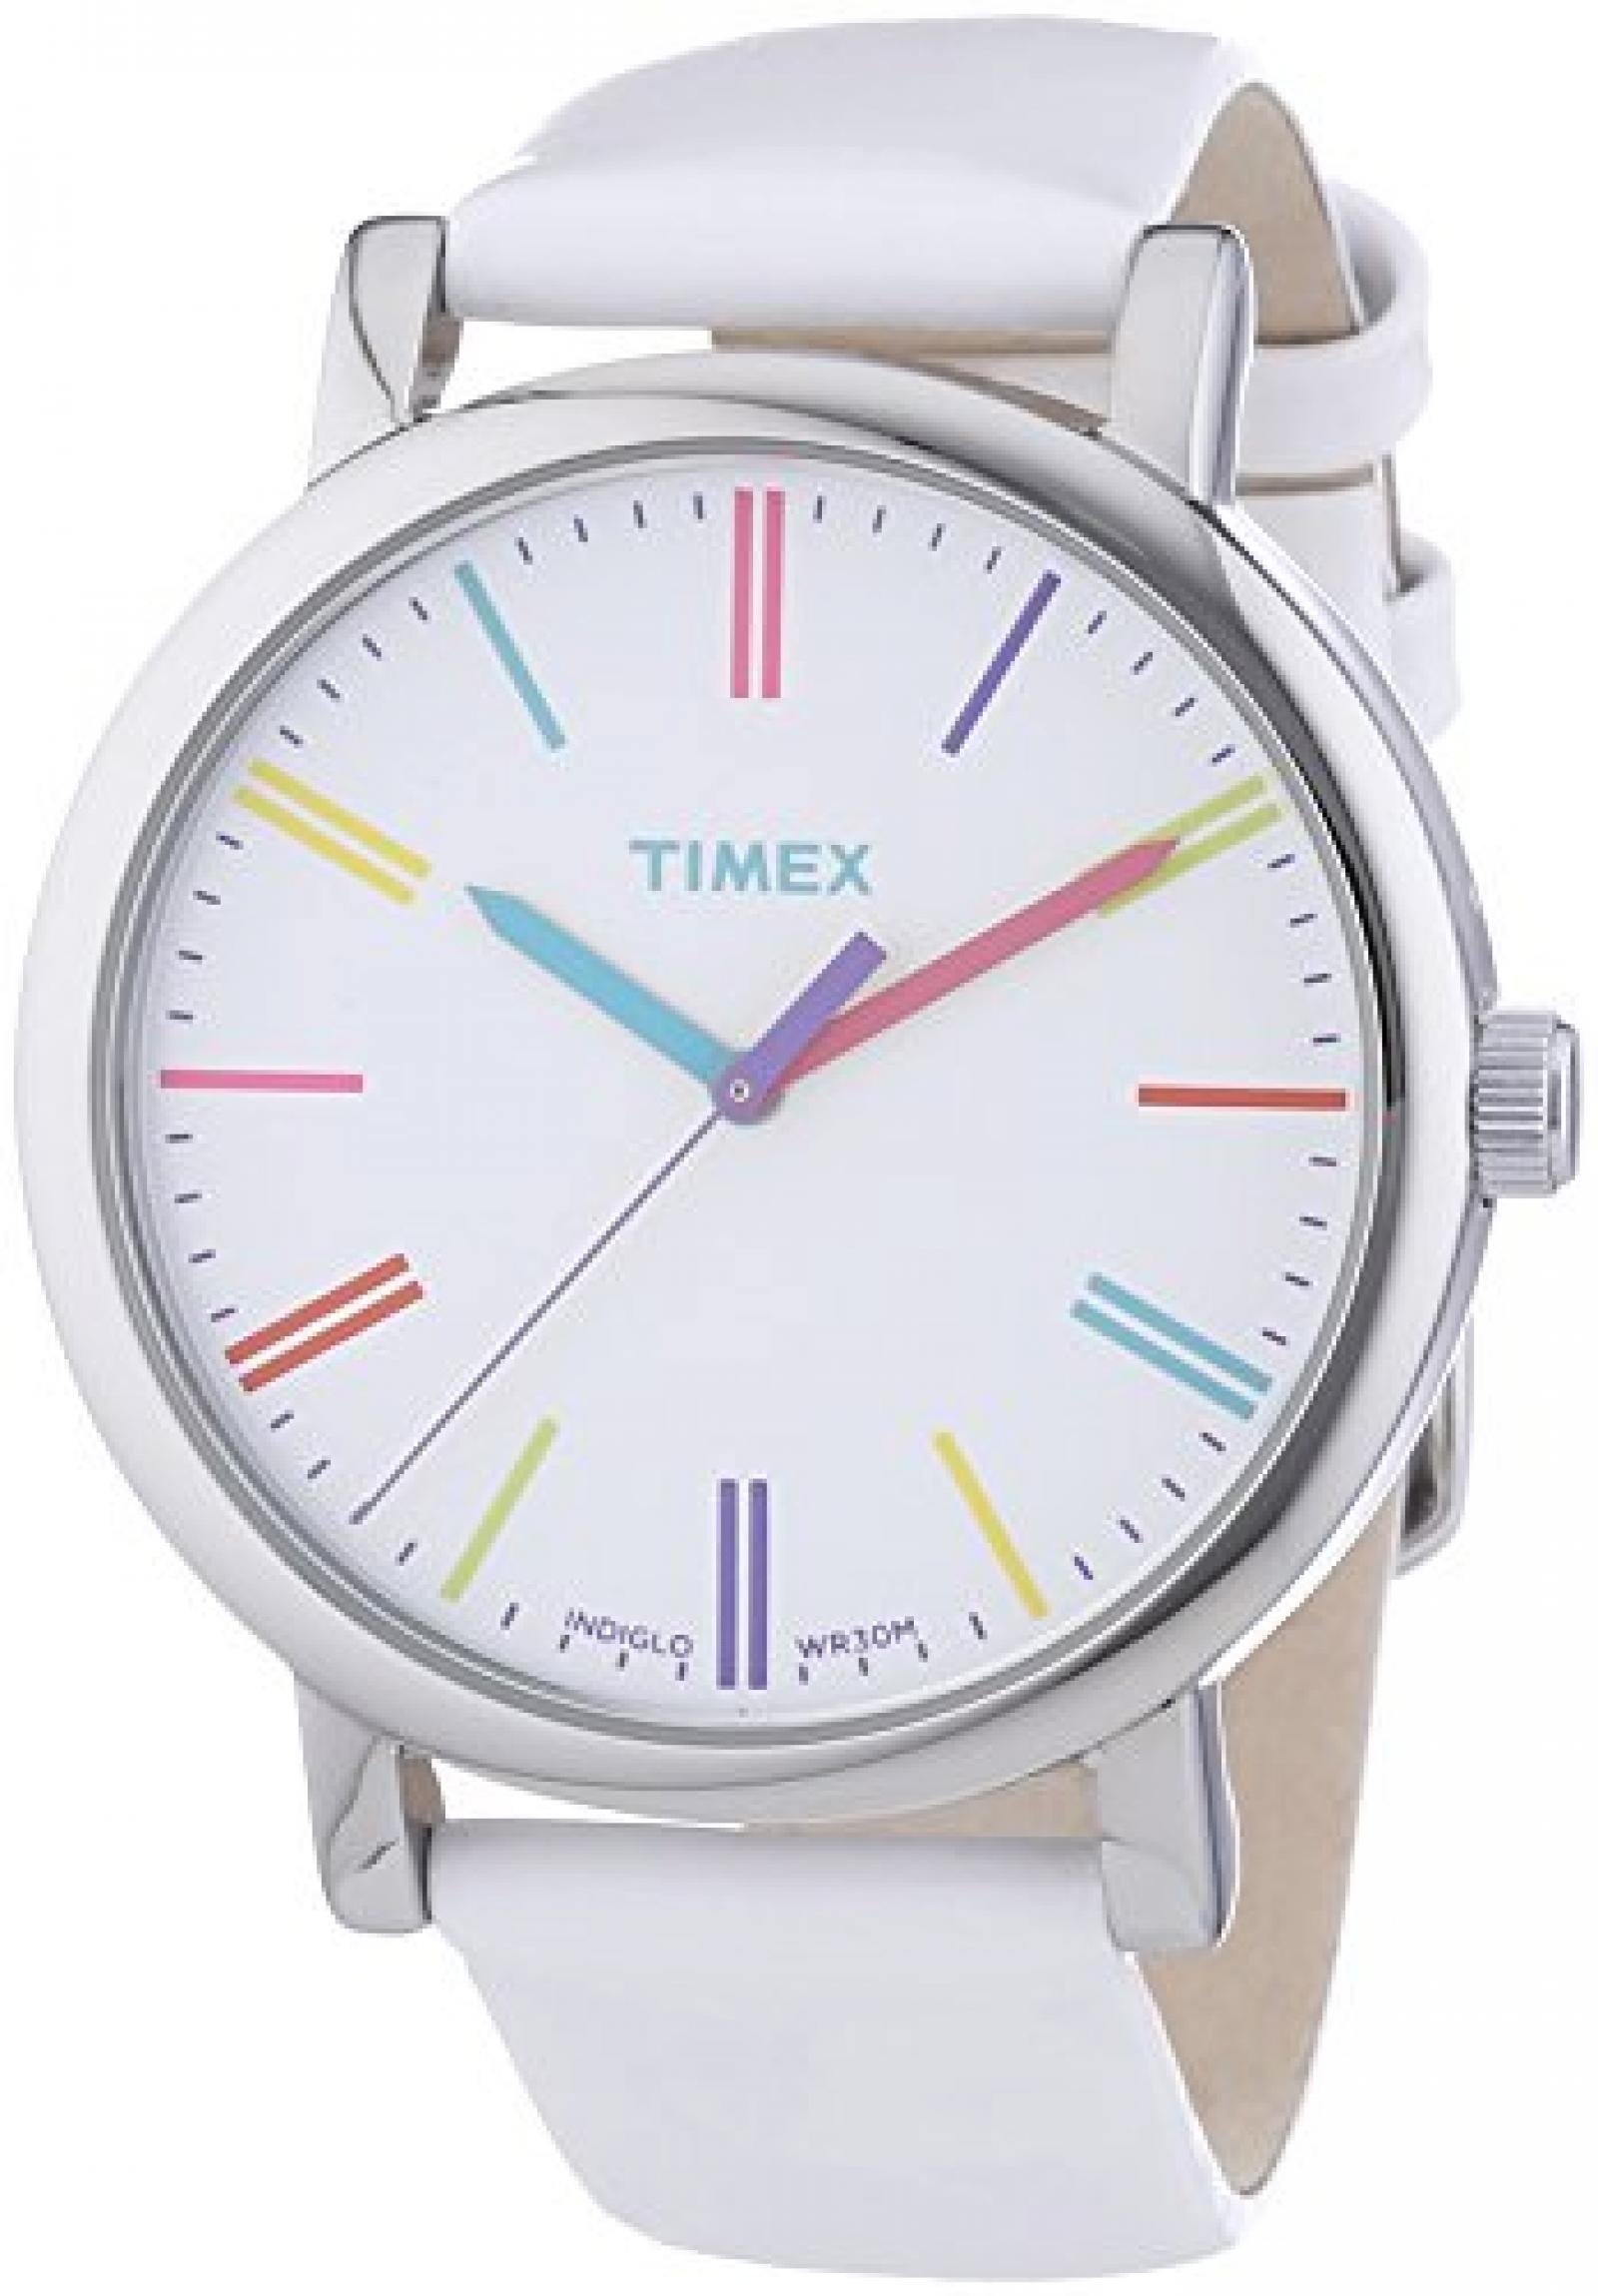 Timex Damen-Armbanduhr Timex Style Analog Leder weiß T2N791D7